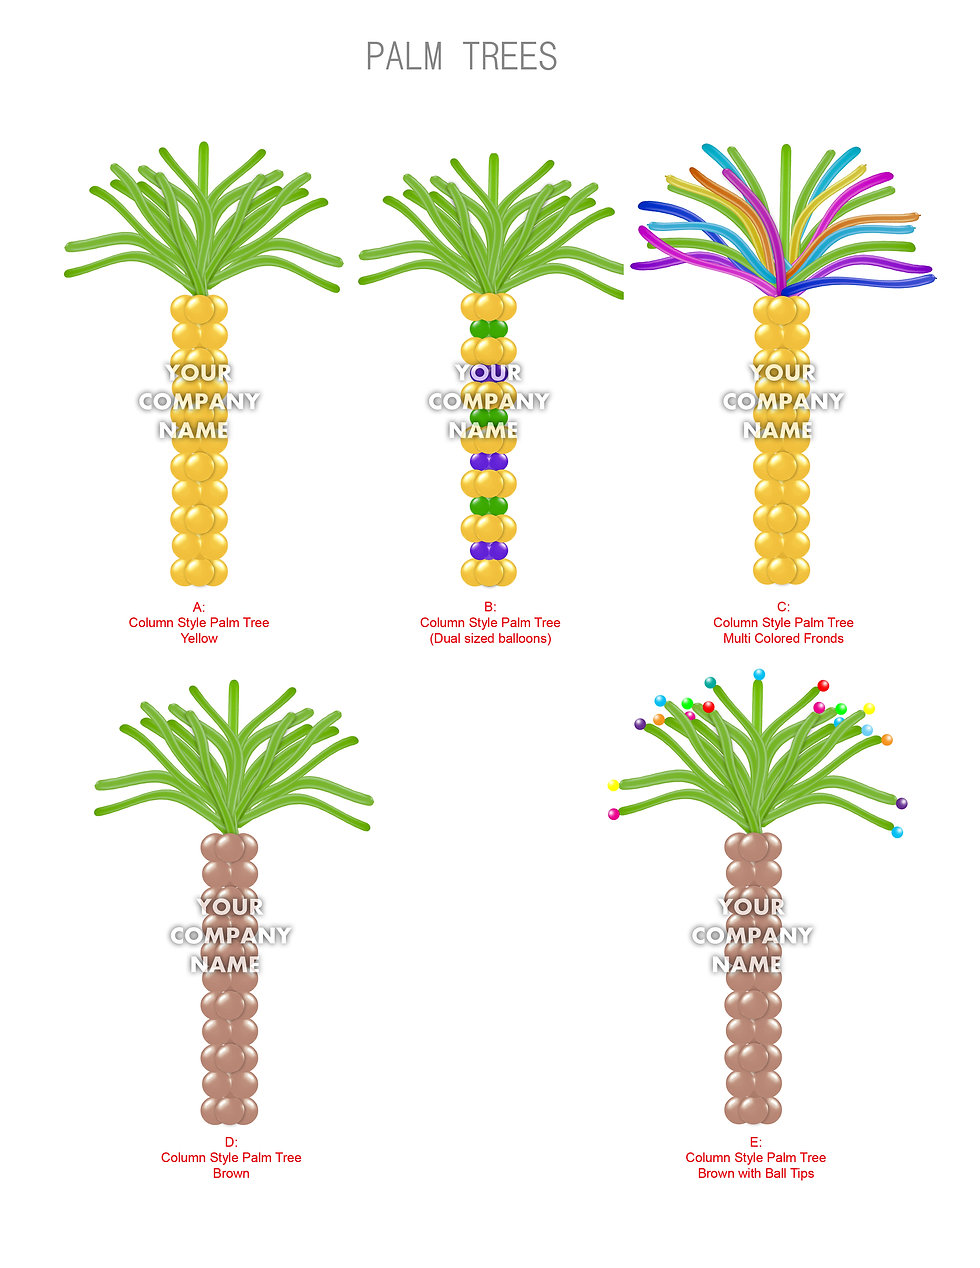 All Palm Trees copy.jpg